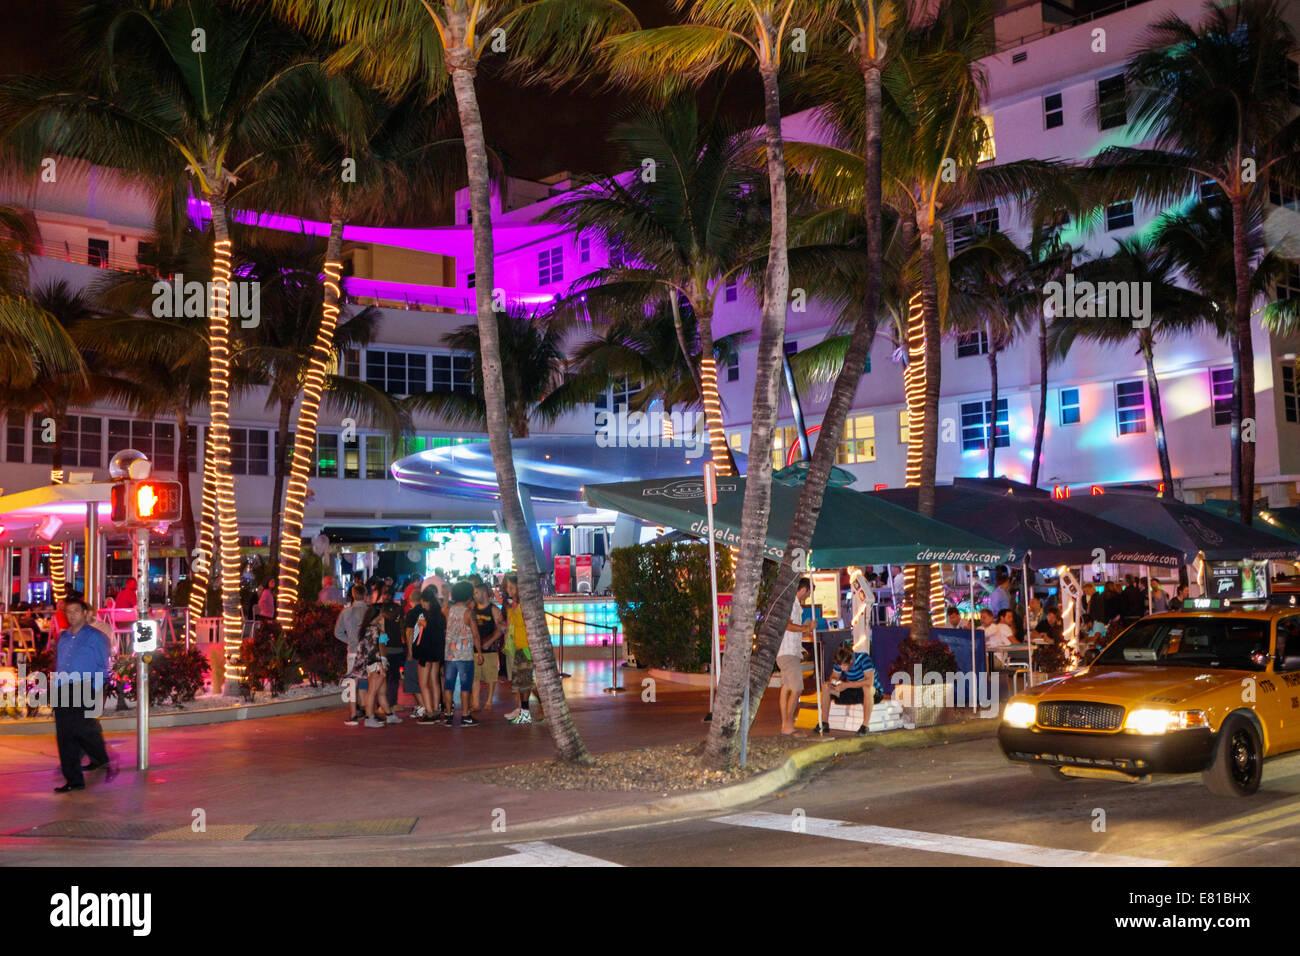 Miami Beach Florida South Art Deco District Ocean Drive Night Nightlife Clevelander Club Restaurant